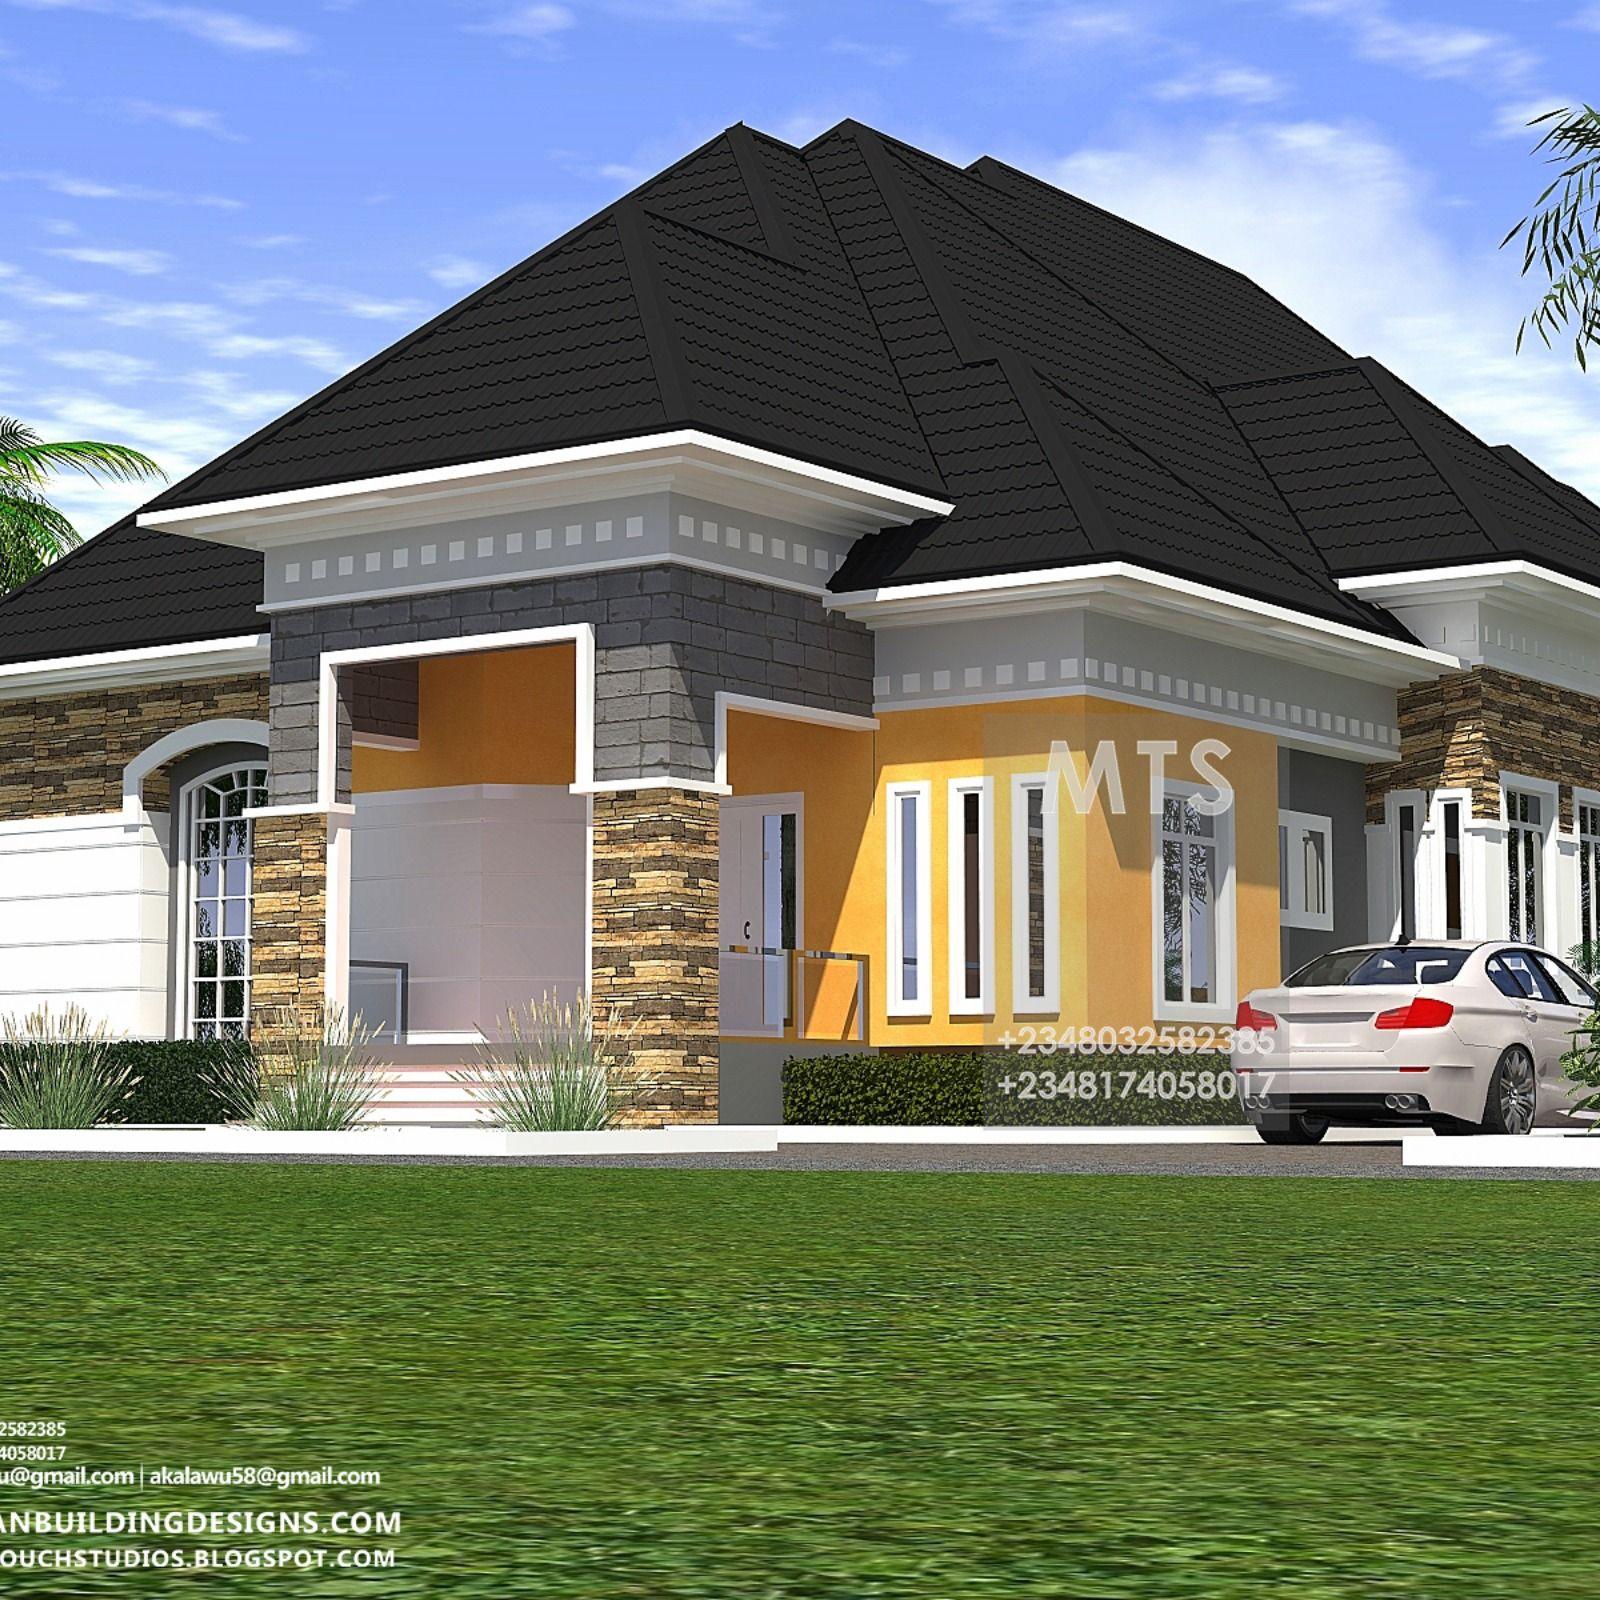 4 Bedroom Bungalow Rf 4007 Modern Bungalow House Bungalow